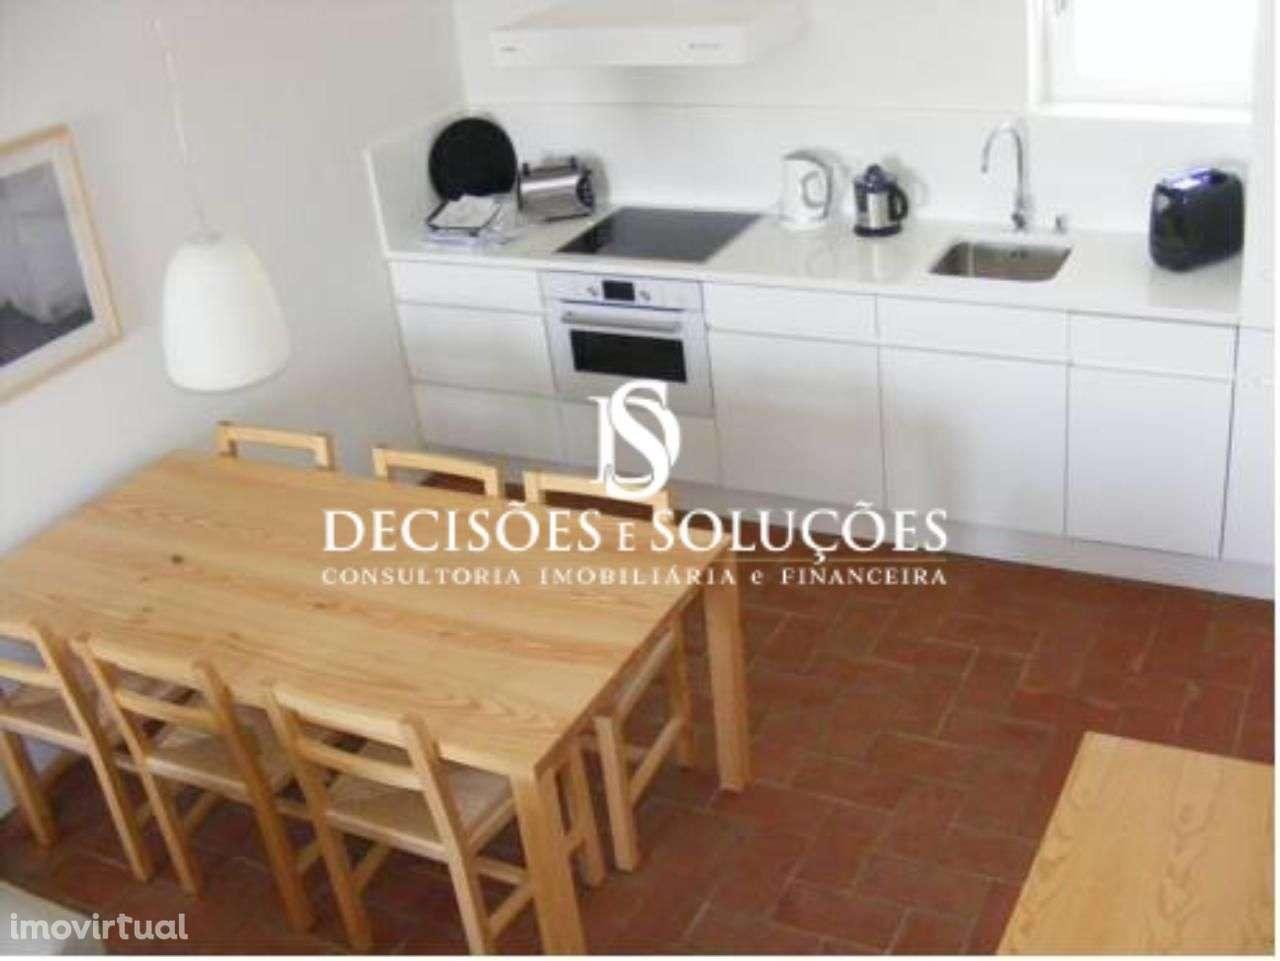 Apartamento para comprar, Tavira (Santa Maria e Santiago), Tavira, Faro - Foto 6